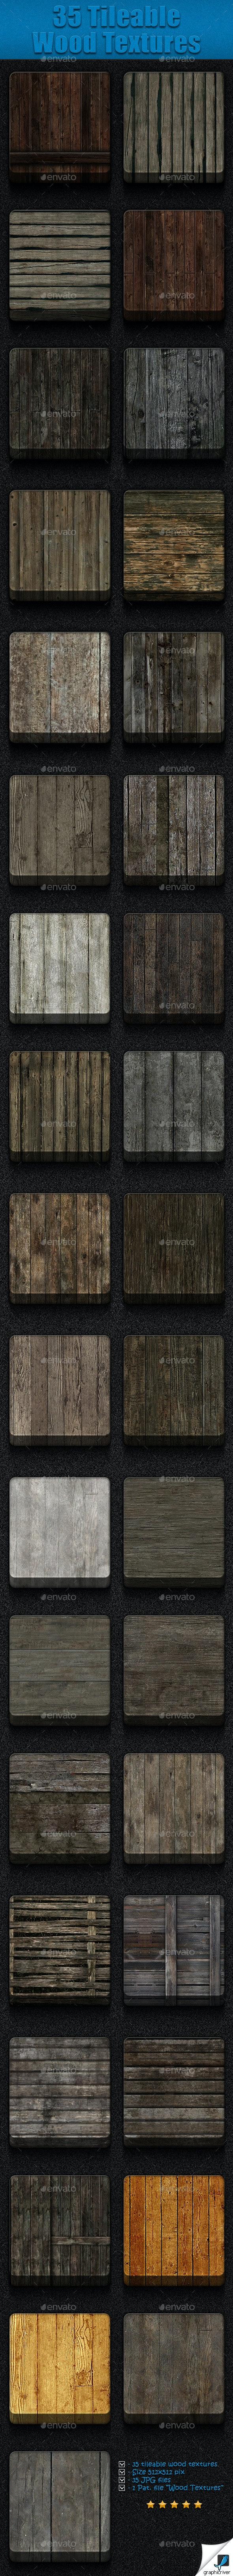 35 Tileable Wood Textures - Wood Textures